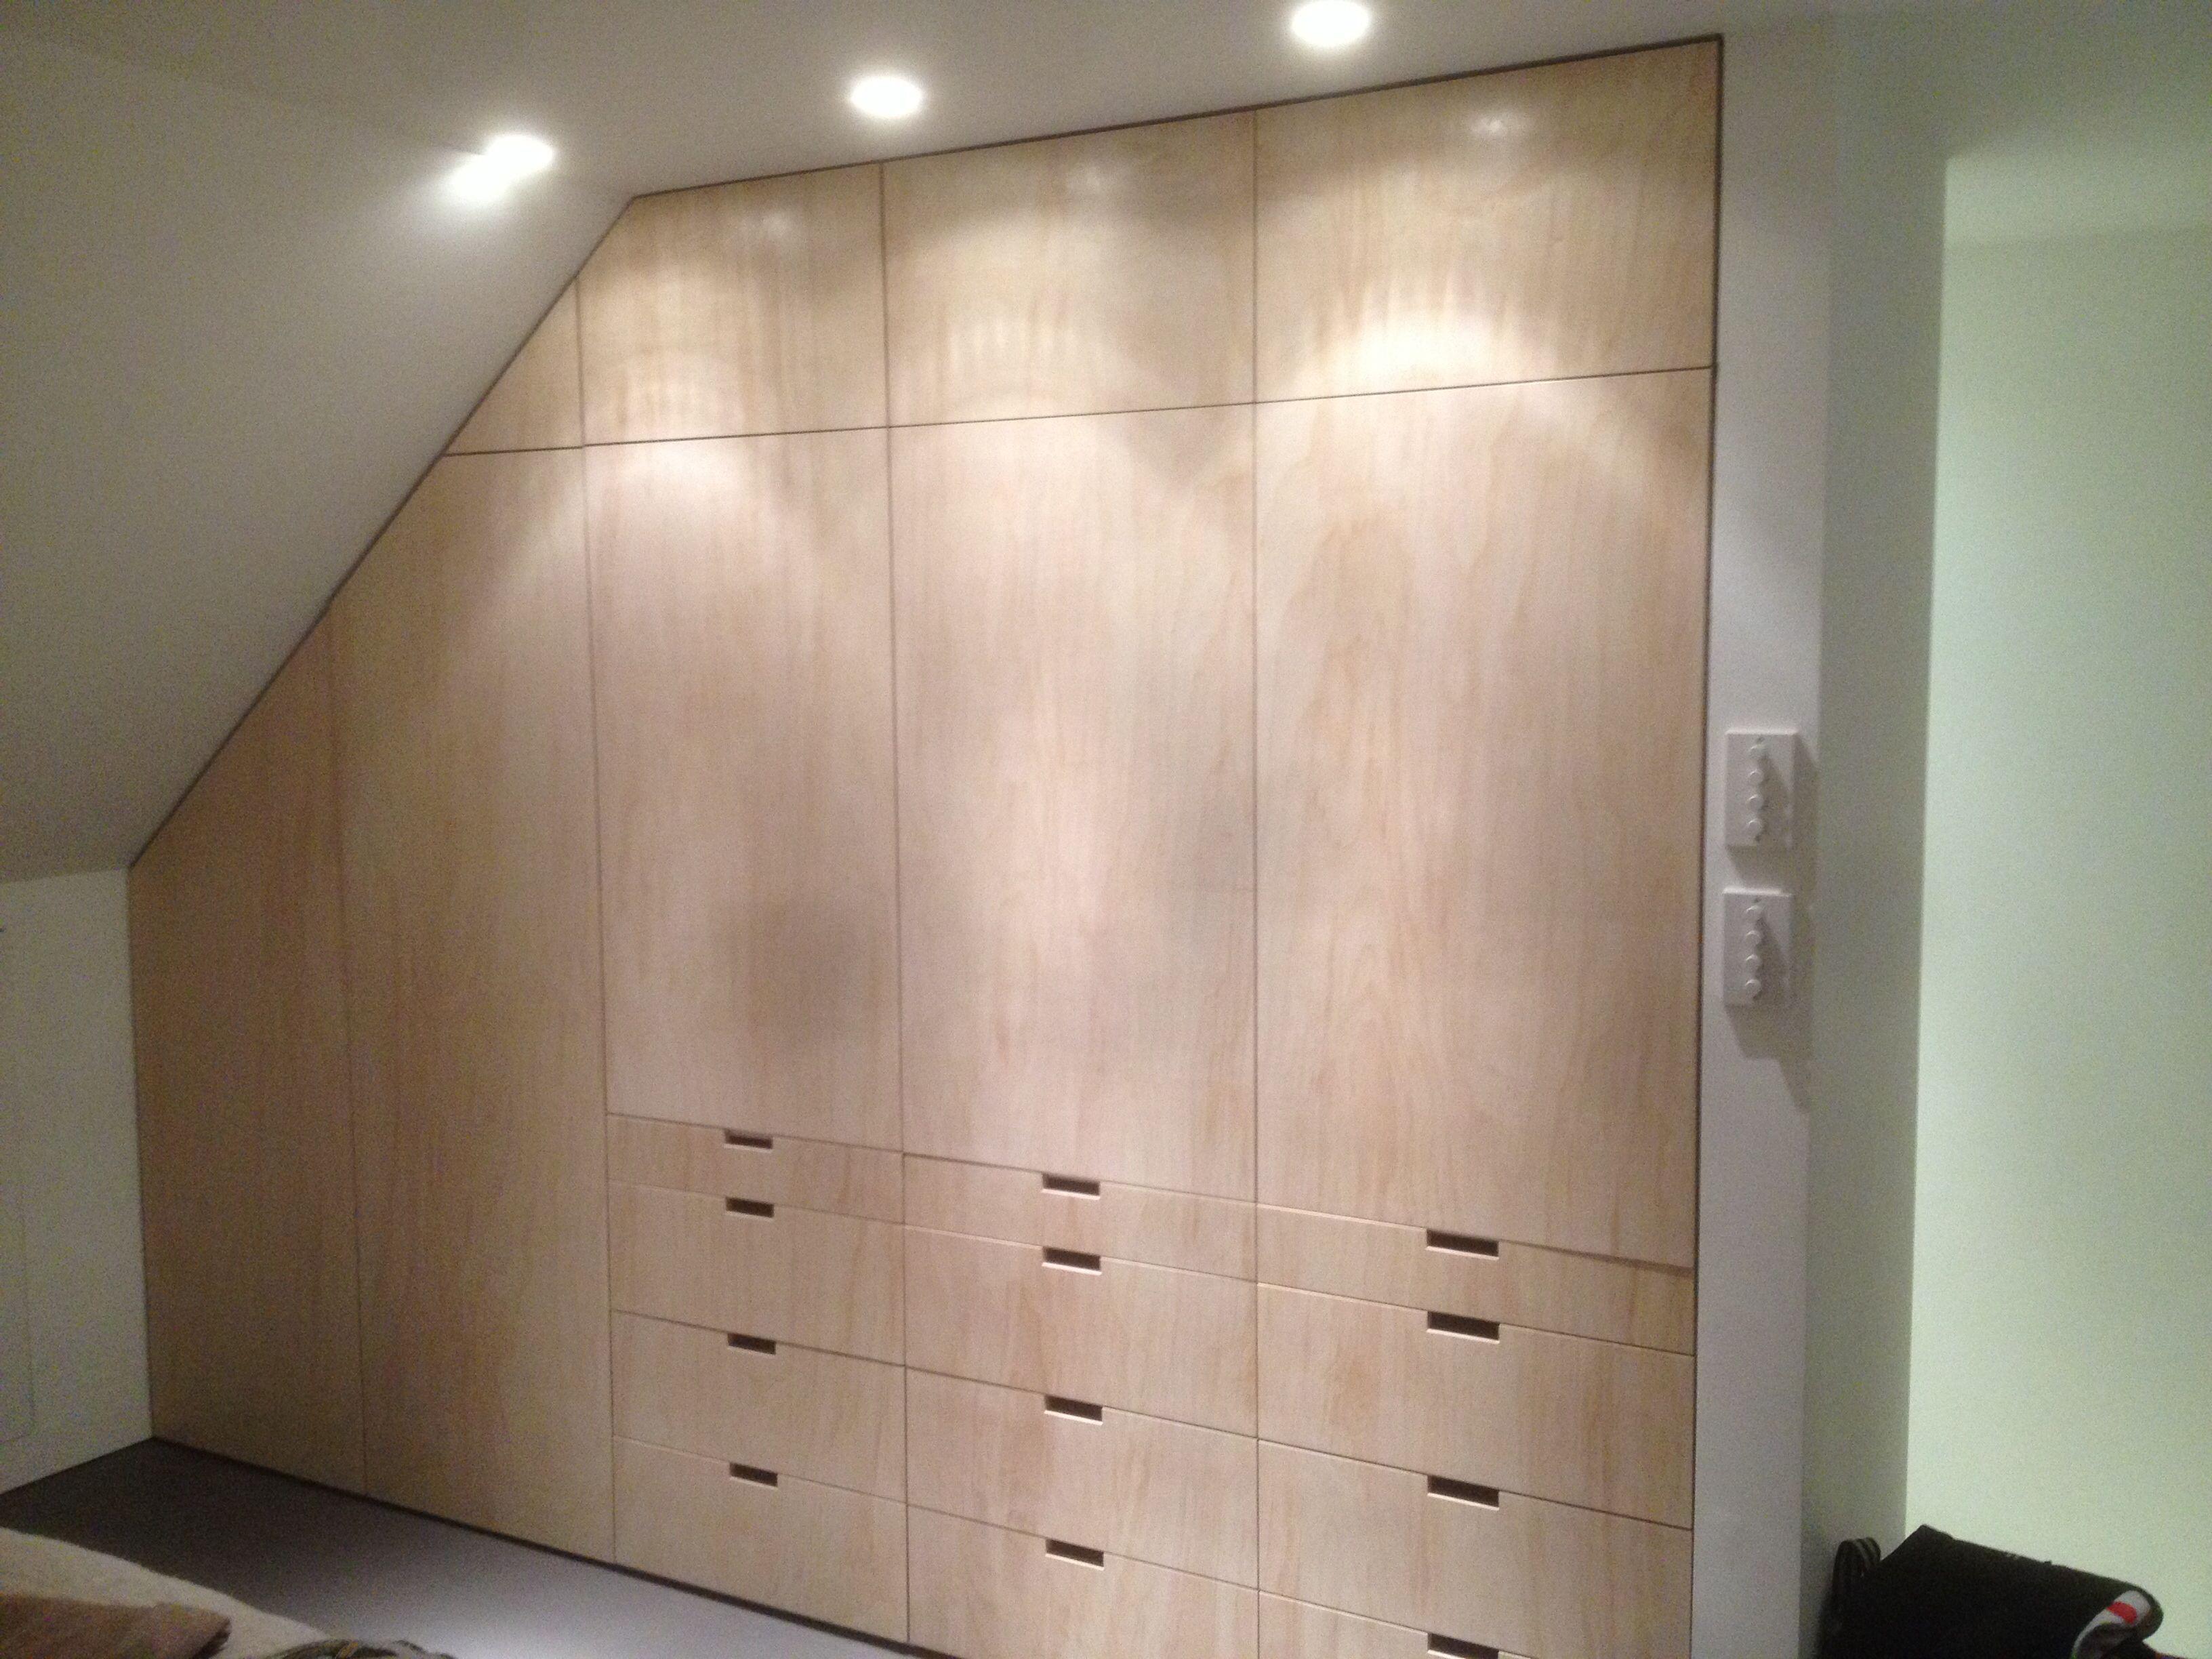 Birch ply wardrobe by fine balance carpentry | Idea's